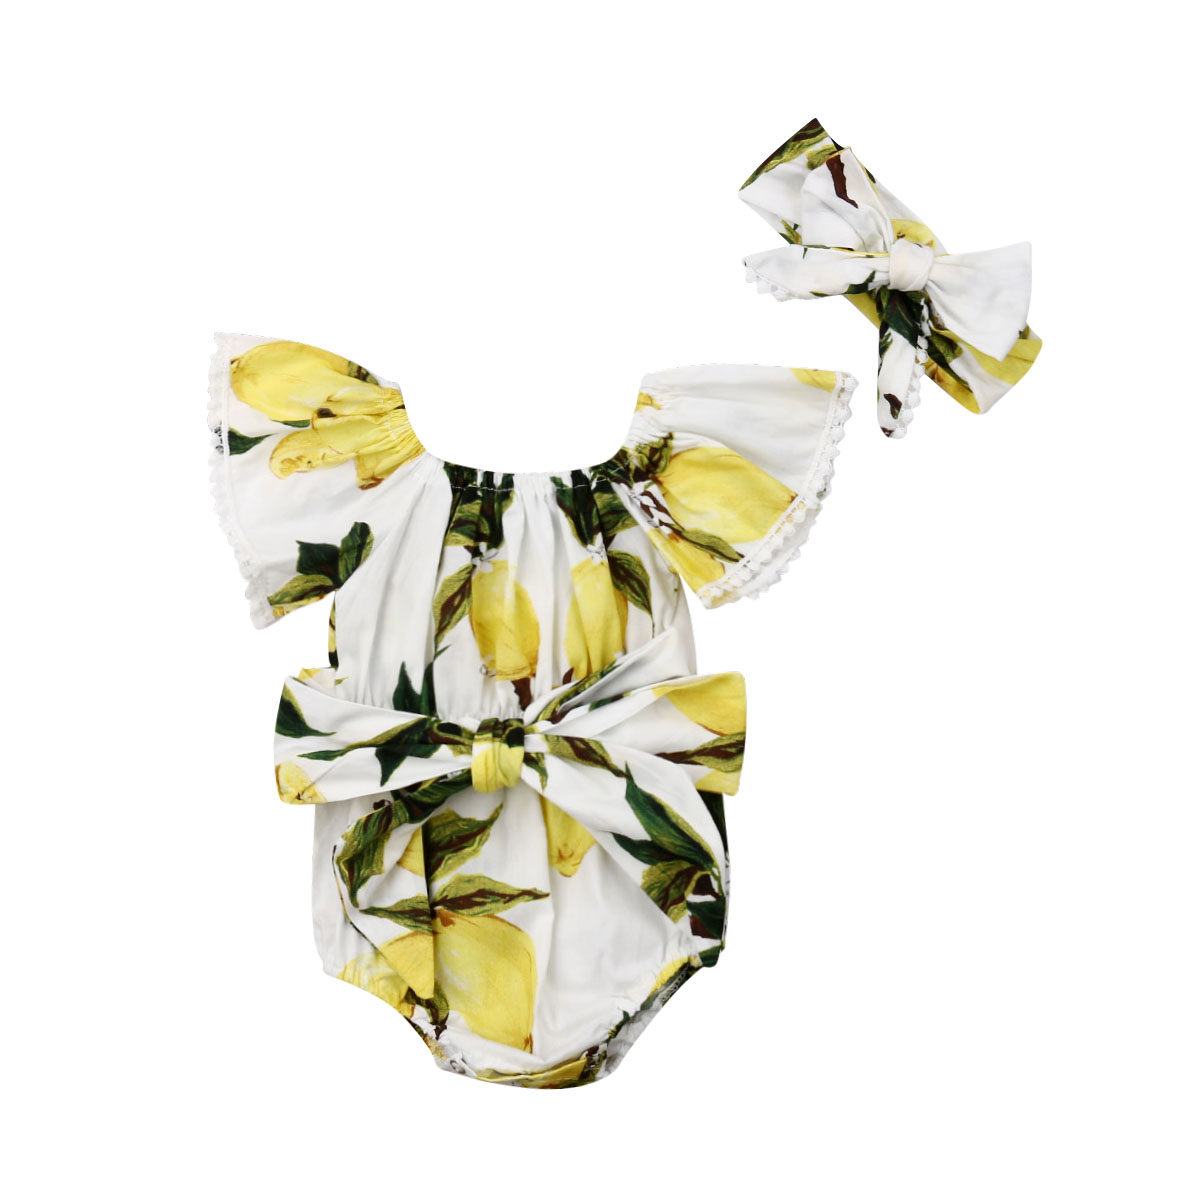 2PCS Infant Baby Girl Clothes Body Baby Belt Lemon Print Off-Shoulder   Romper   Bow Headband Sunsuit Outfit 0-18M Set